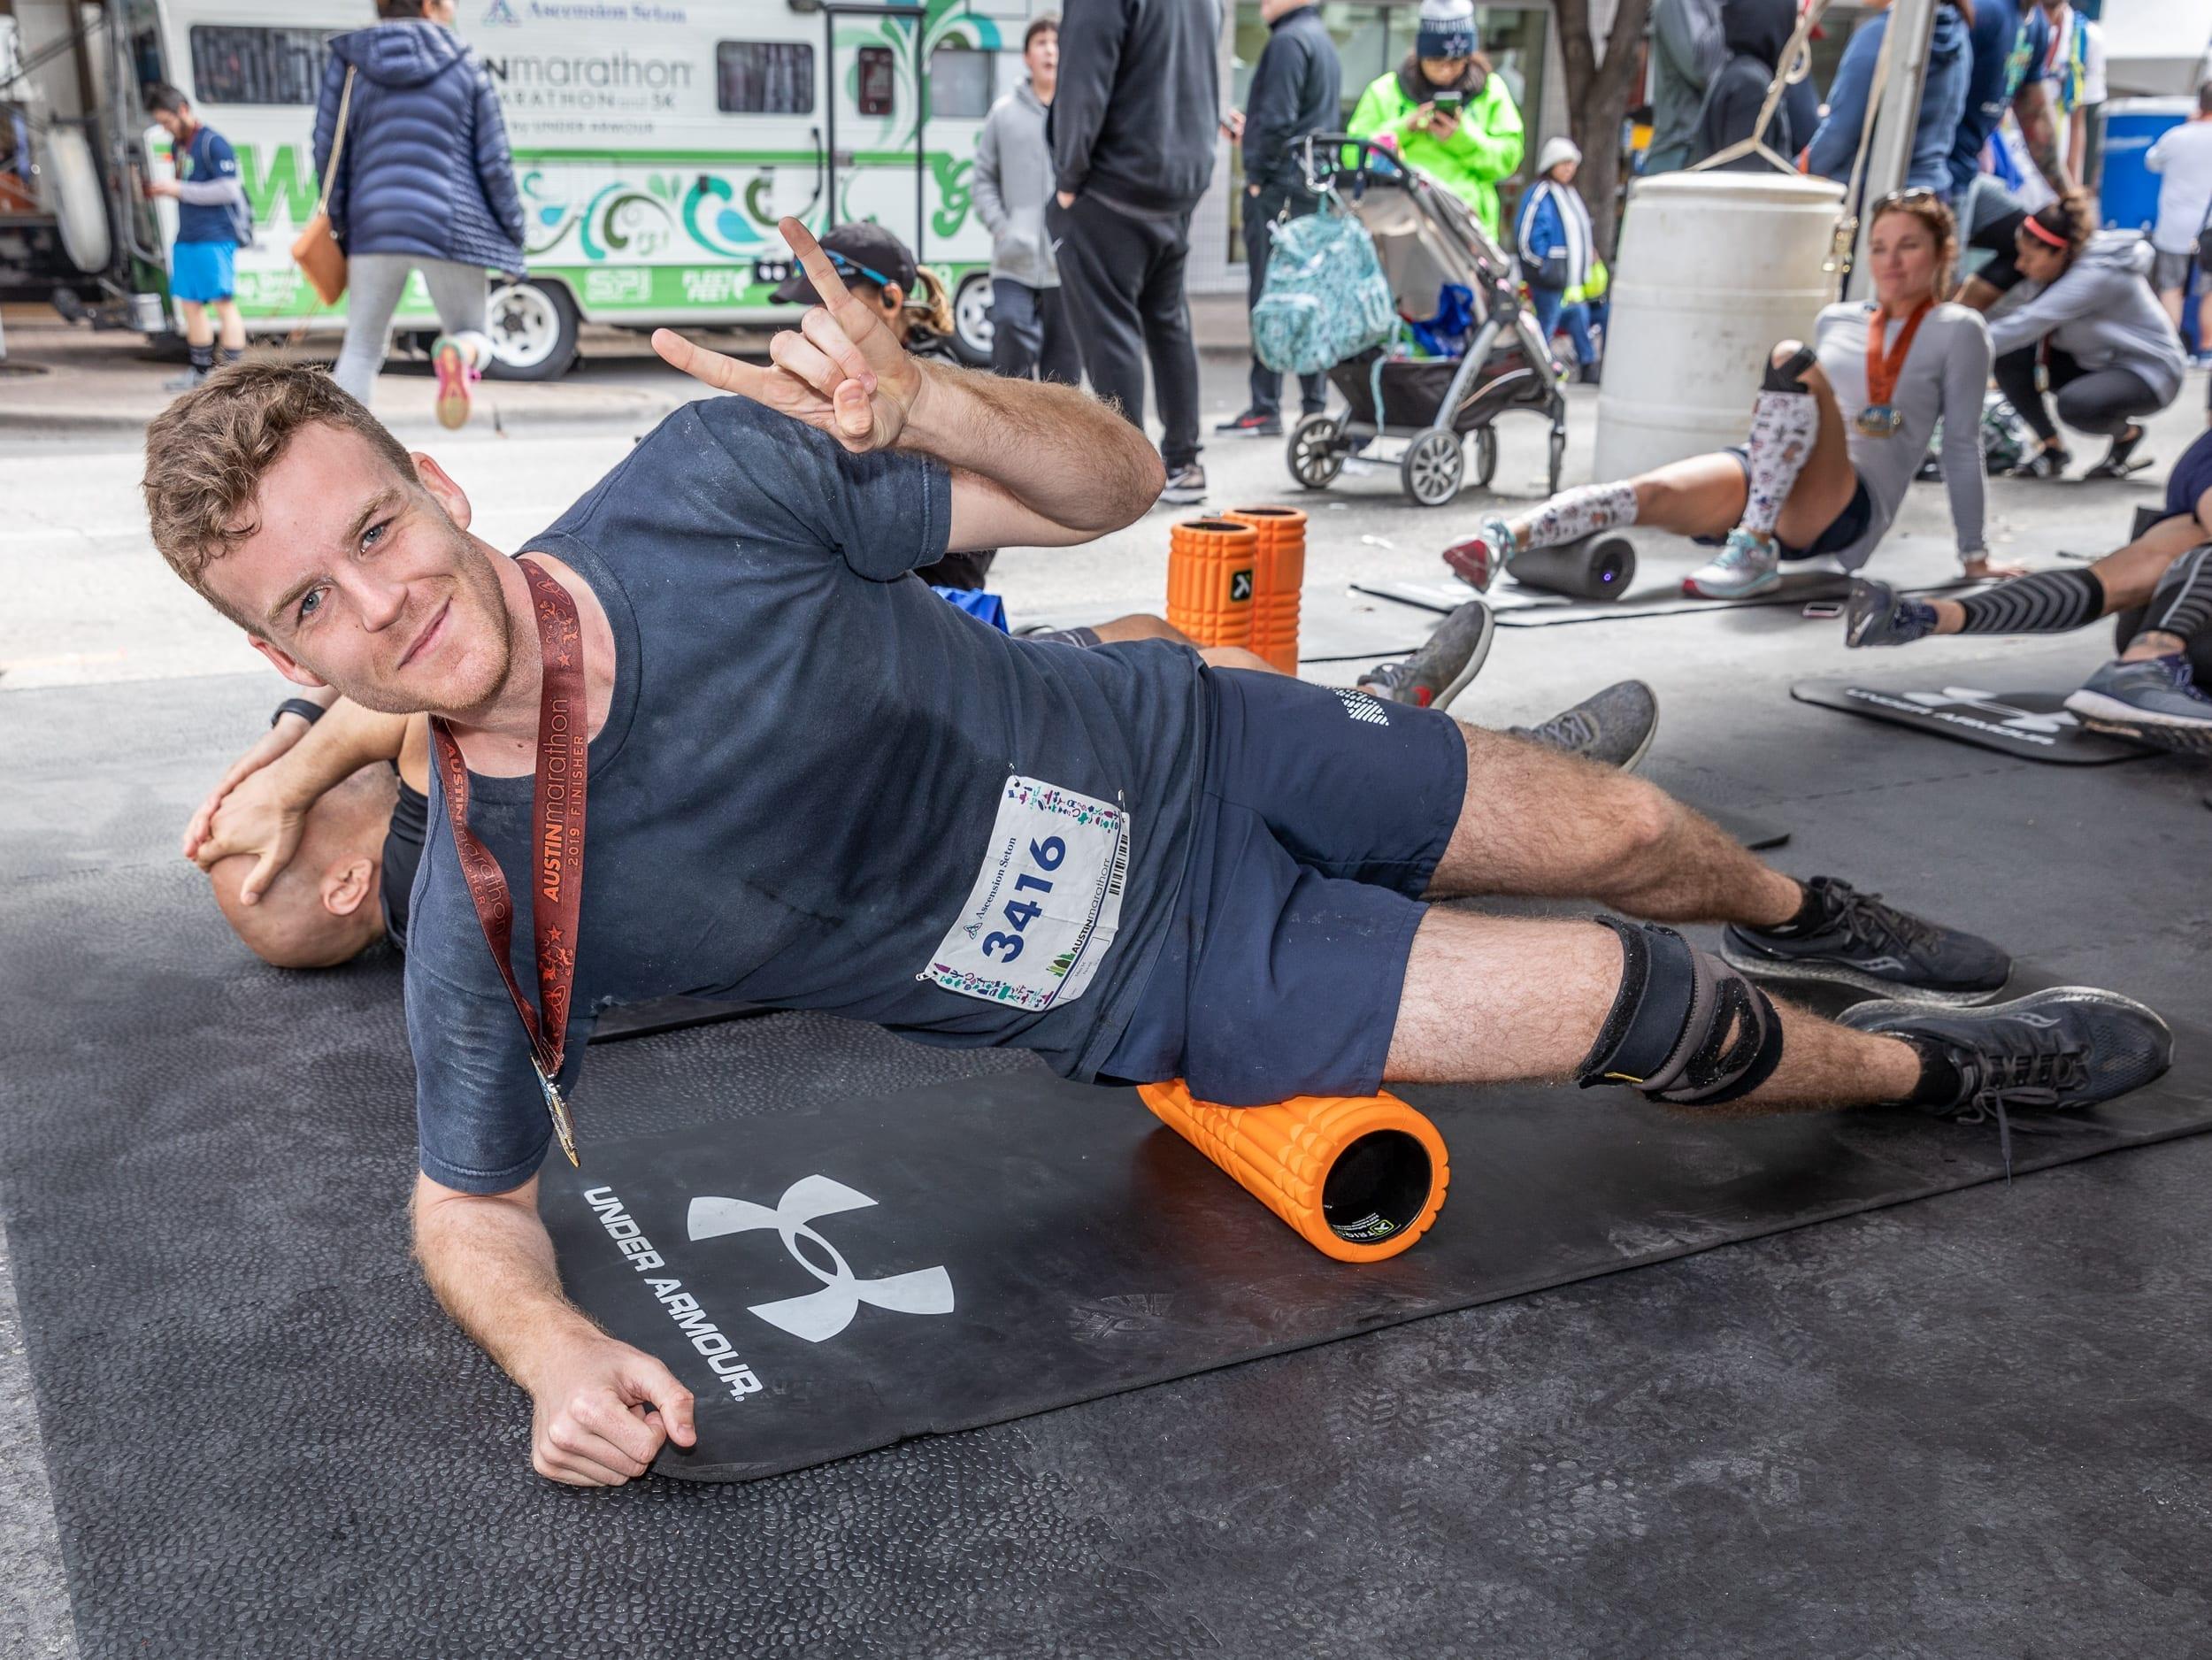 Runner foam rolls after 2019 Austin Marathon, a great tip to see improvement during training!